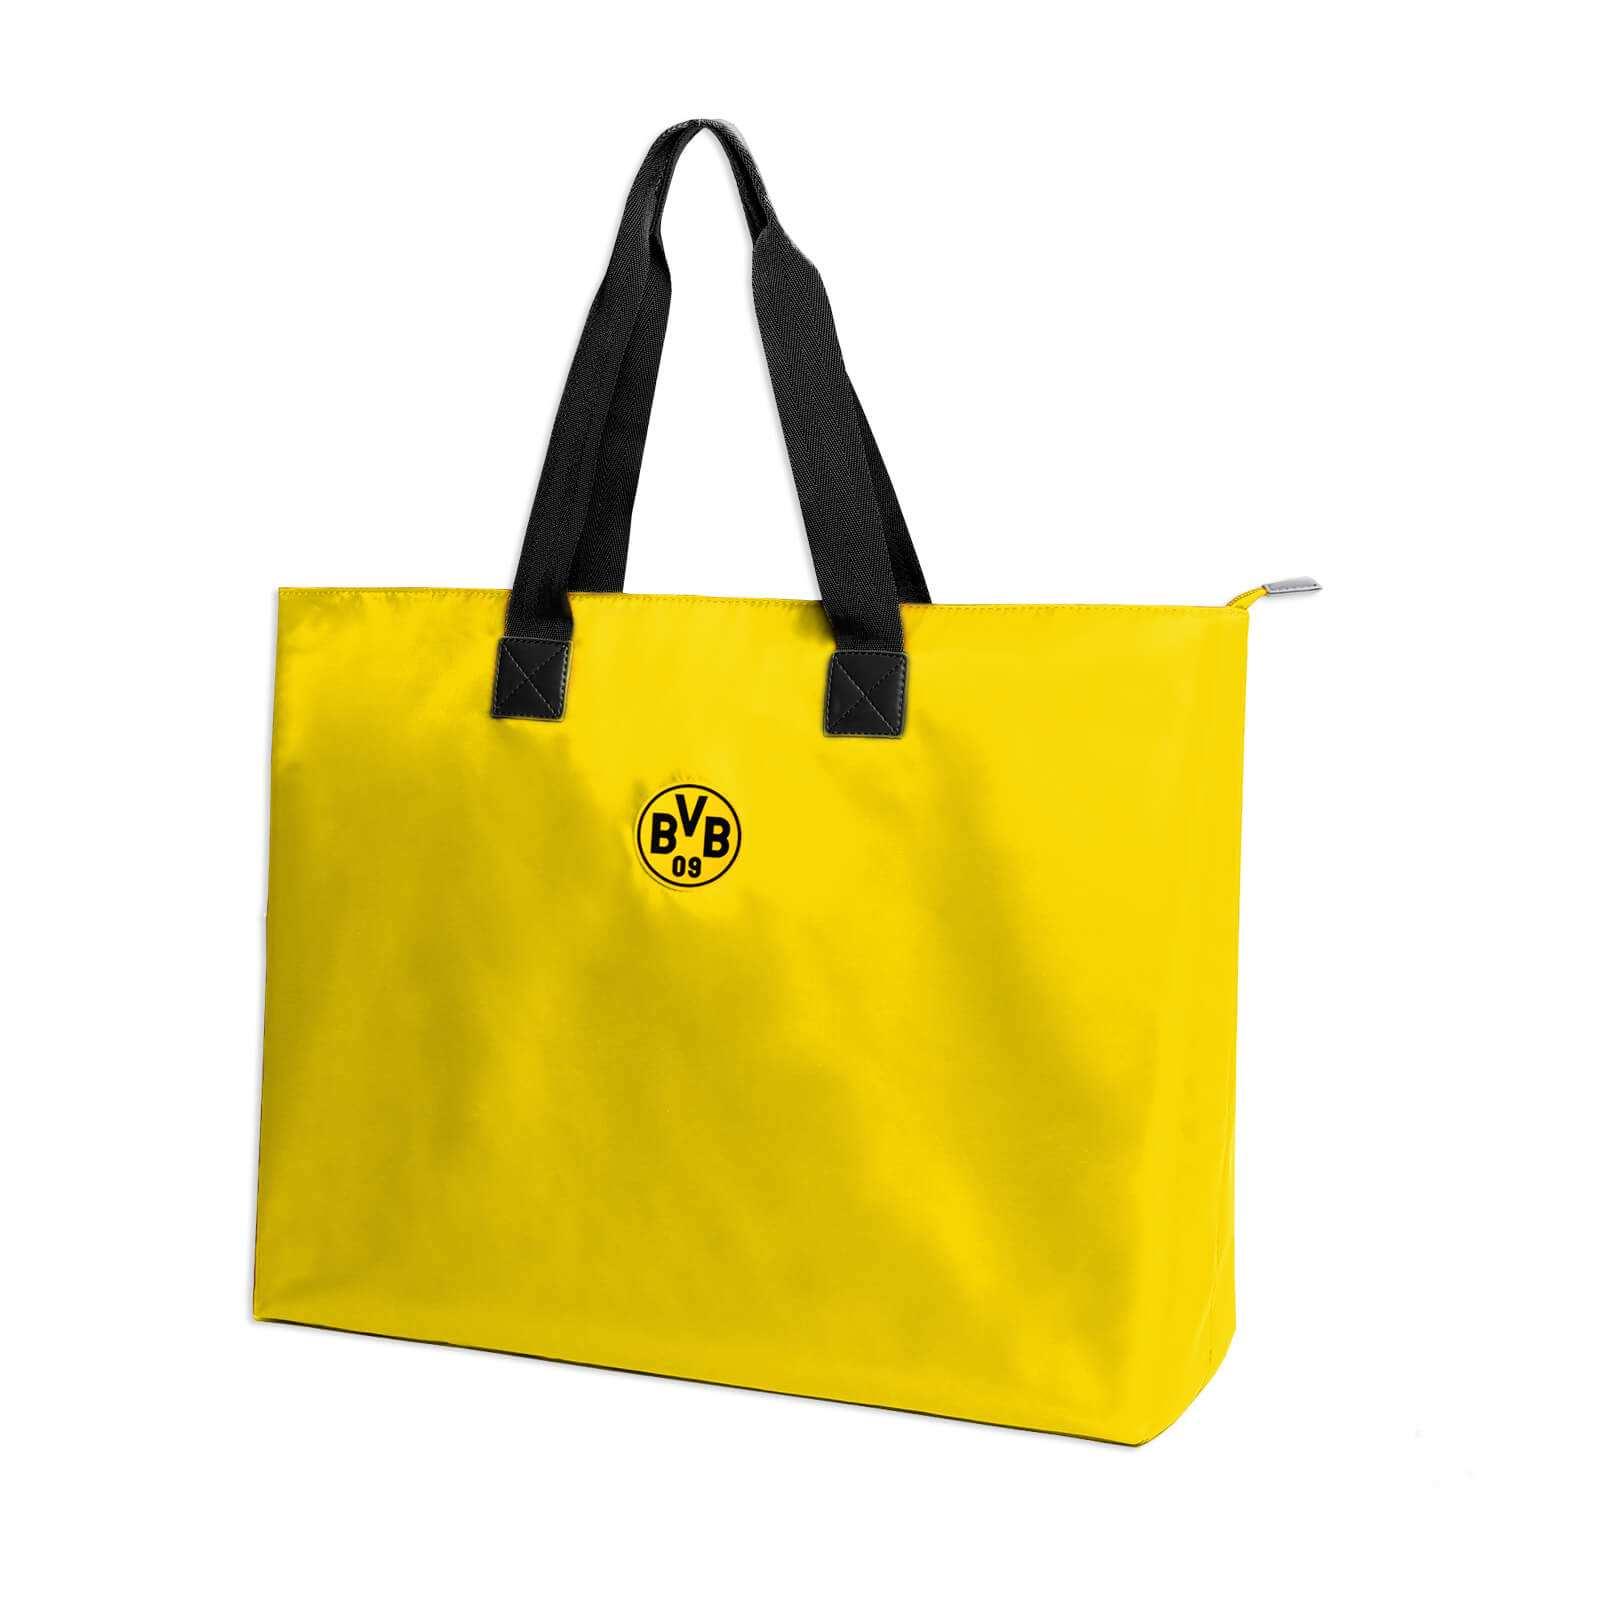 BVB Strandtasche